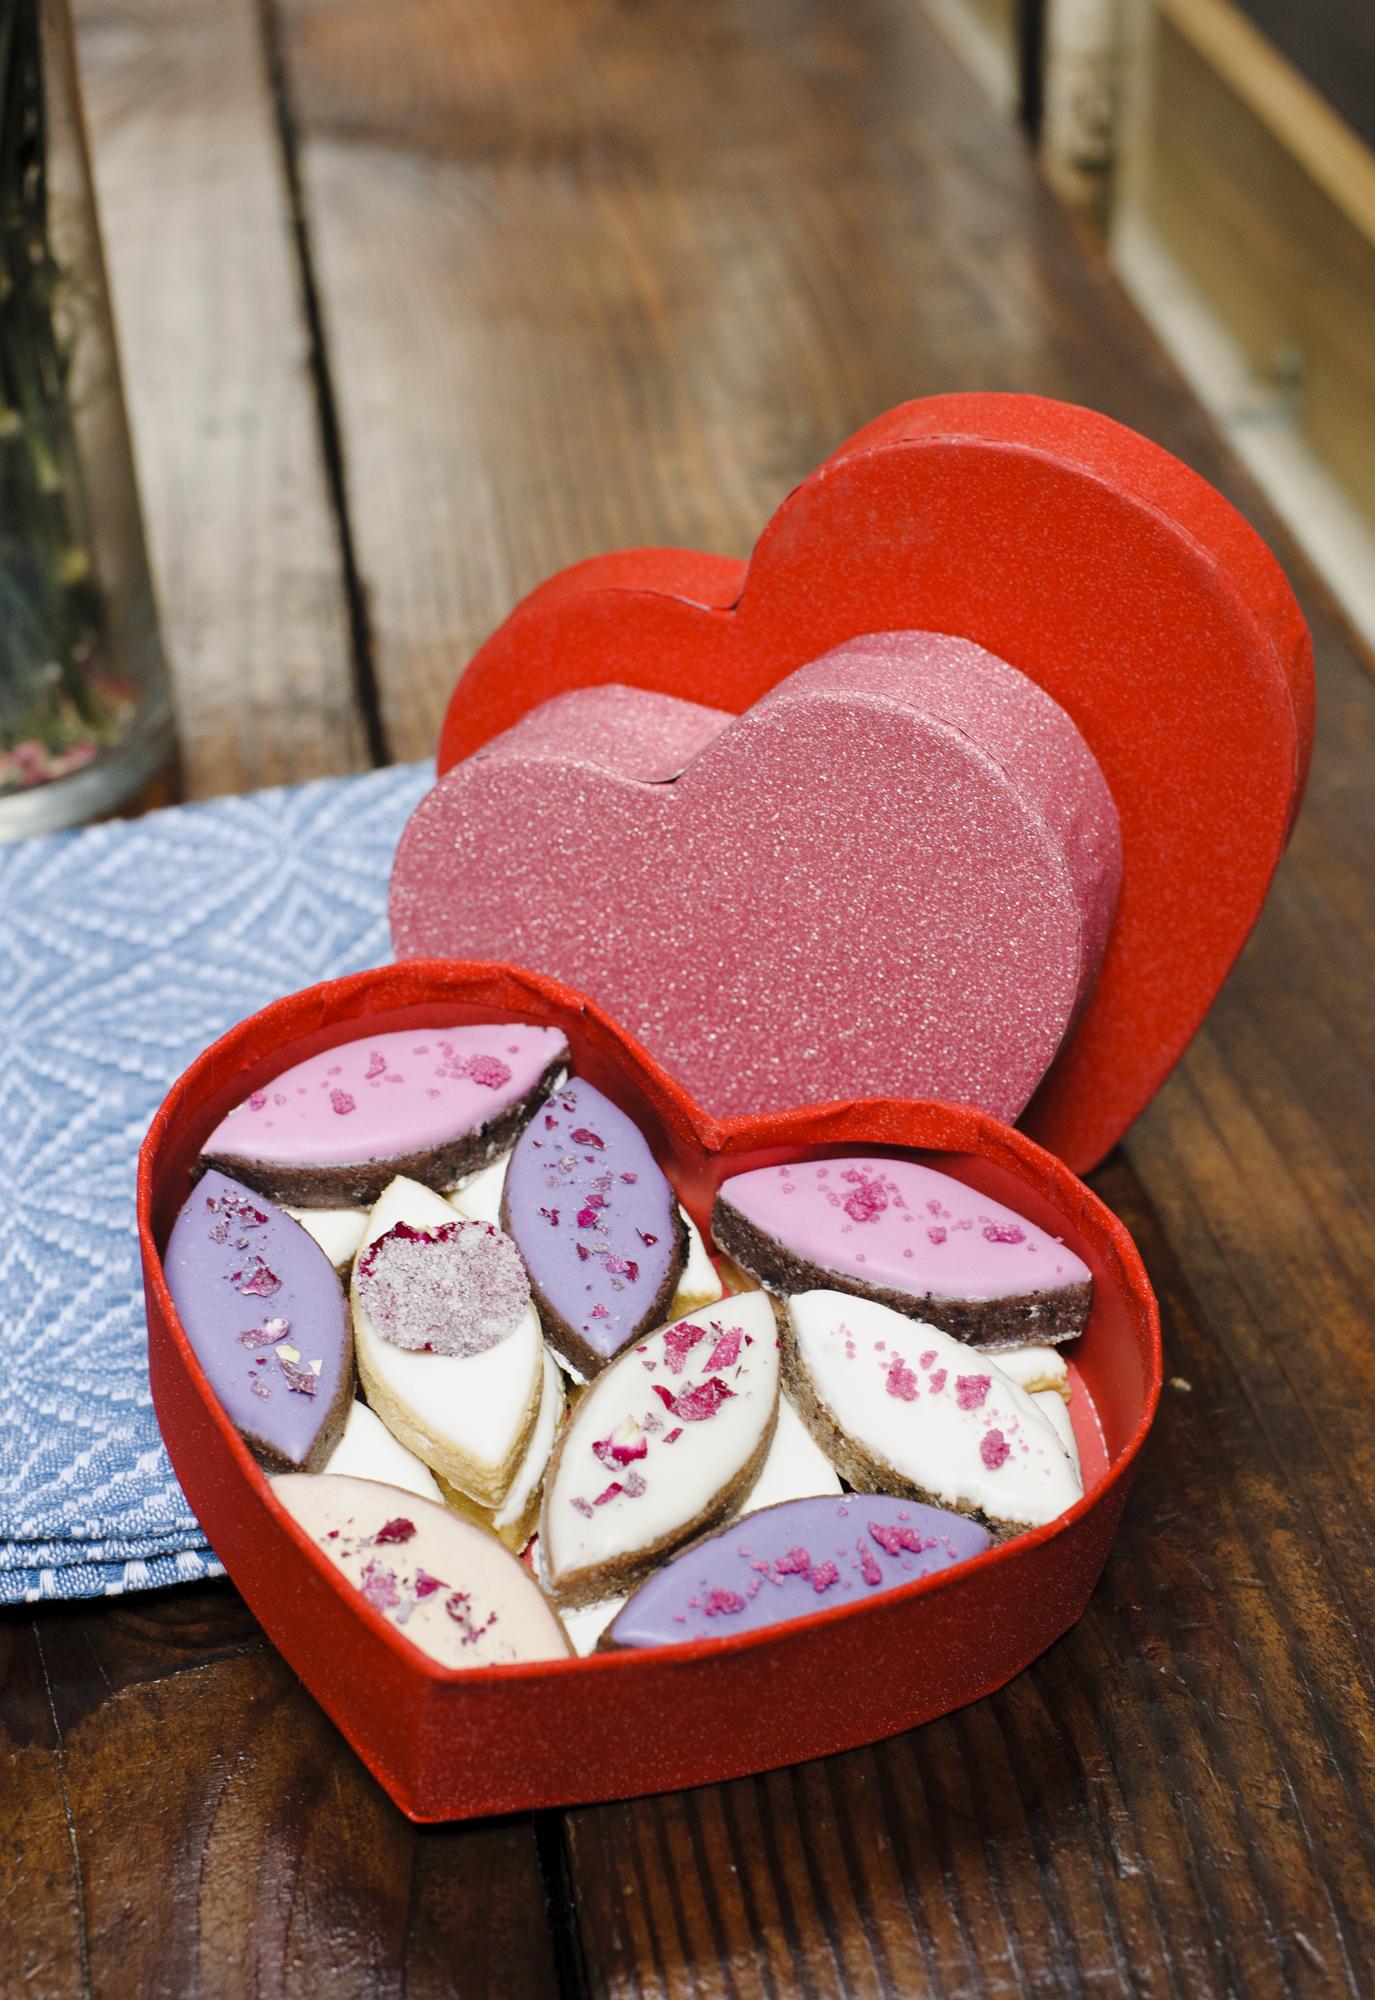 dana-confections-valentines-2017_carmen-ladipo_21.jpg